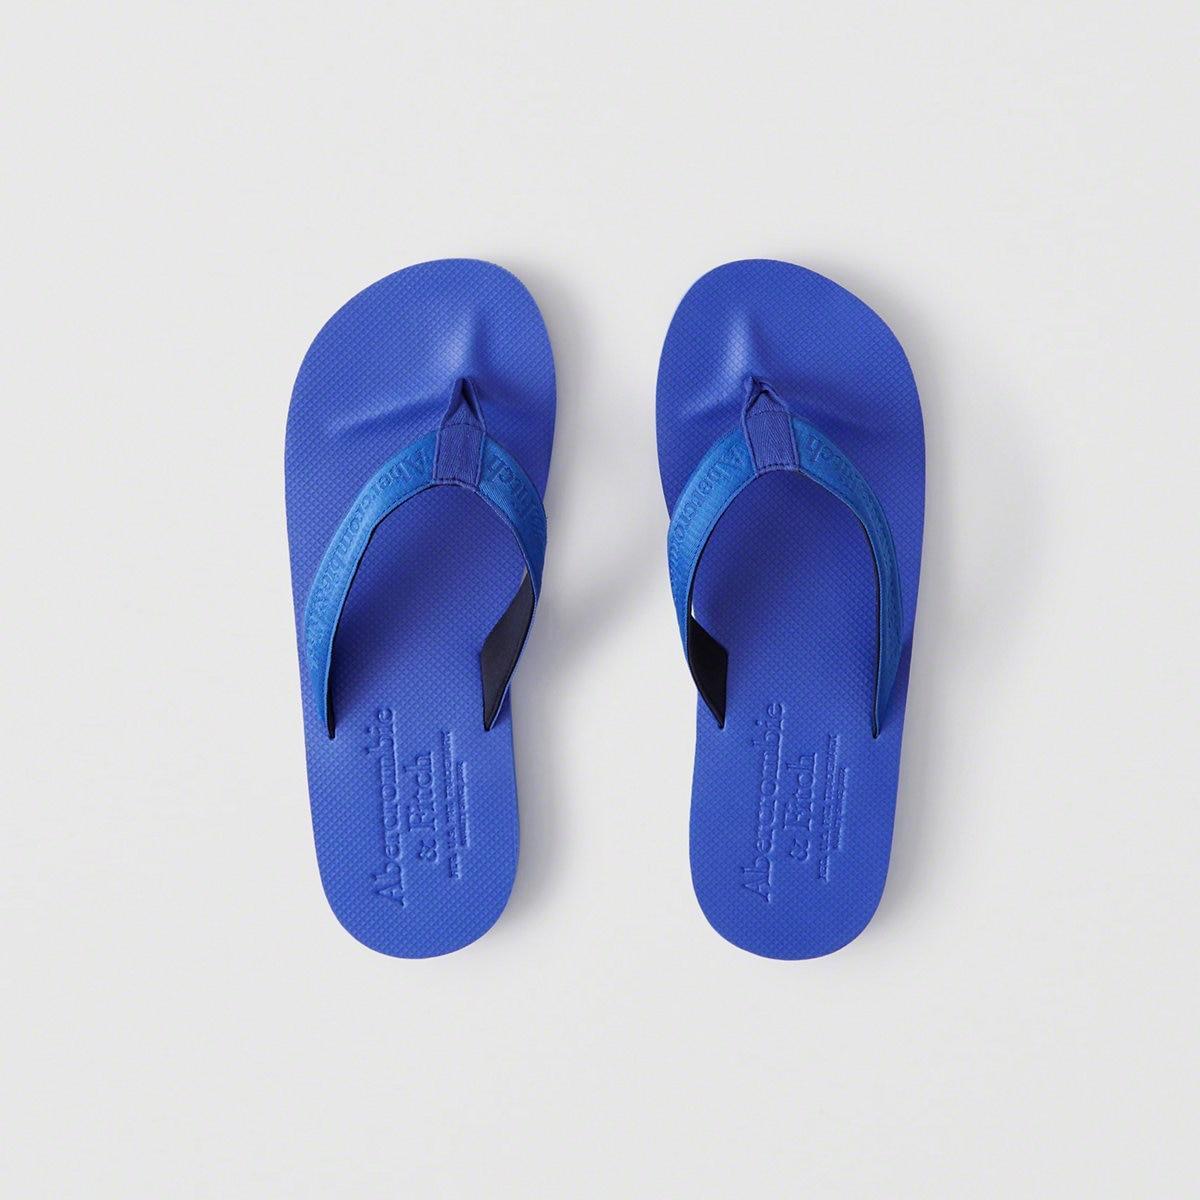 0b2122dac5ae0e Lyst - Abercrombie   Fitch A f Flip Flops in Blue for Men